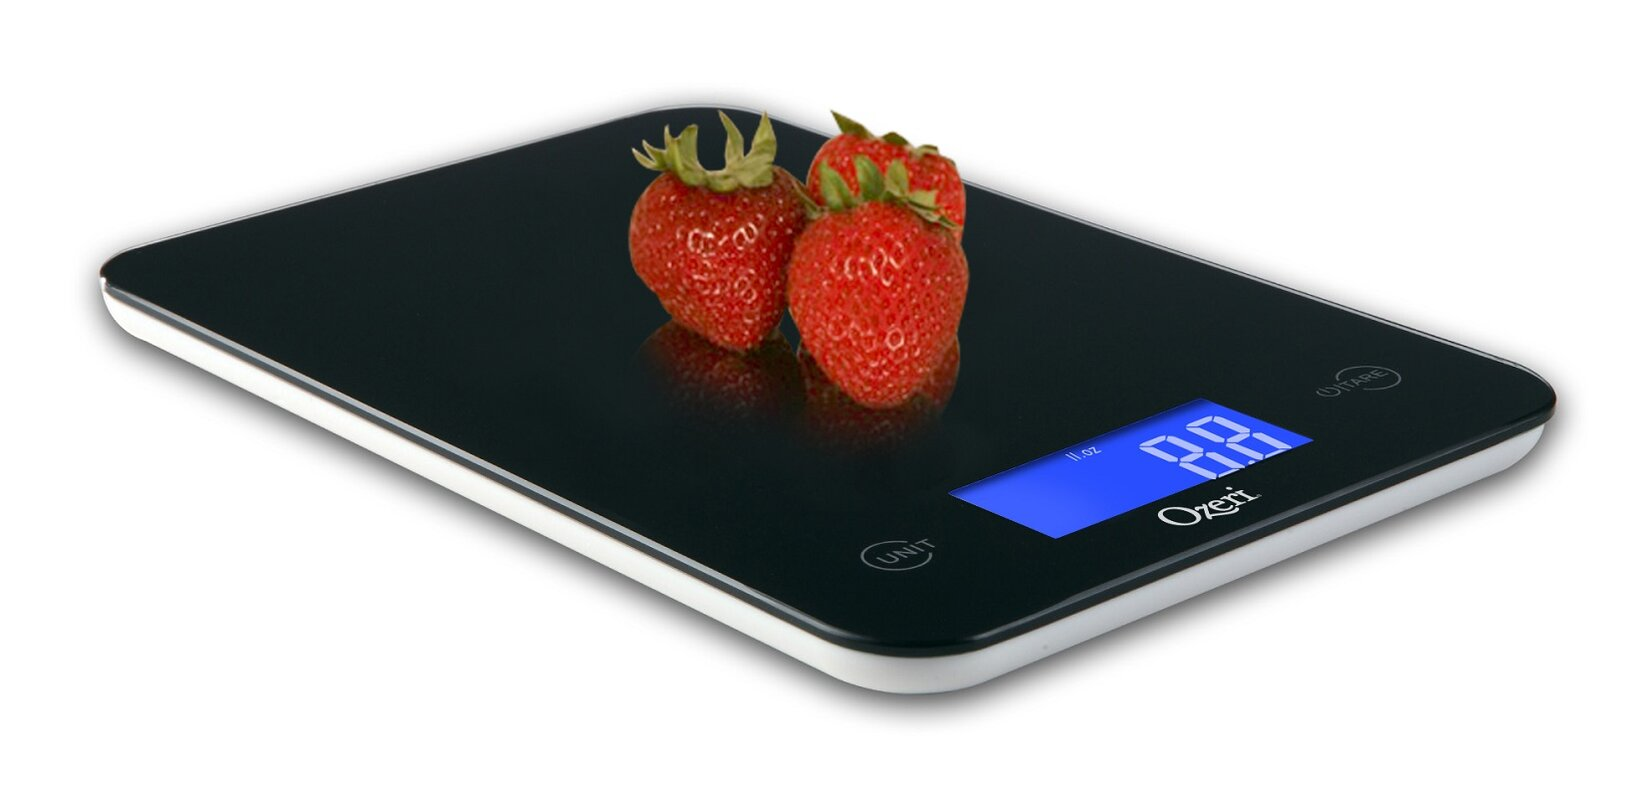 Digital Kitchen Scale Ozeri Touch Professional Digital Kitchen Scale 18 Lbs Edition